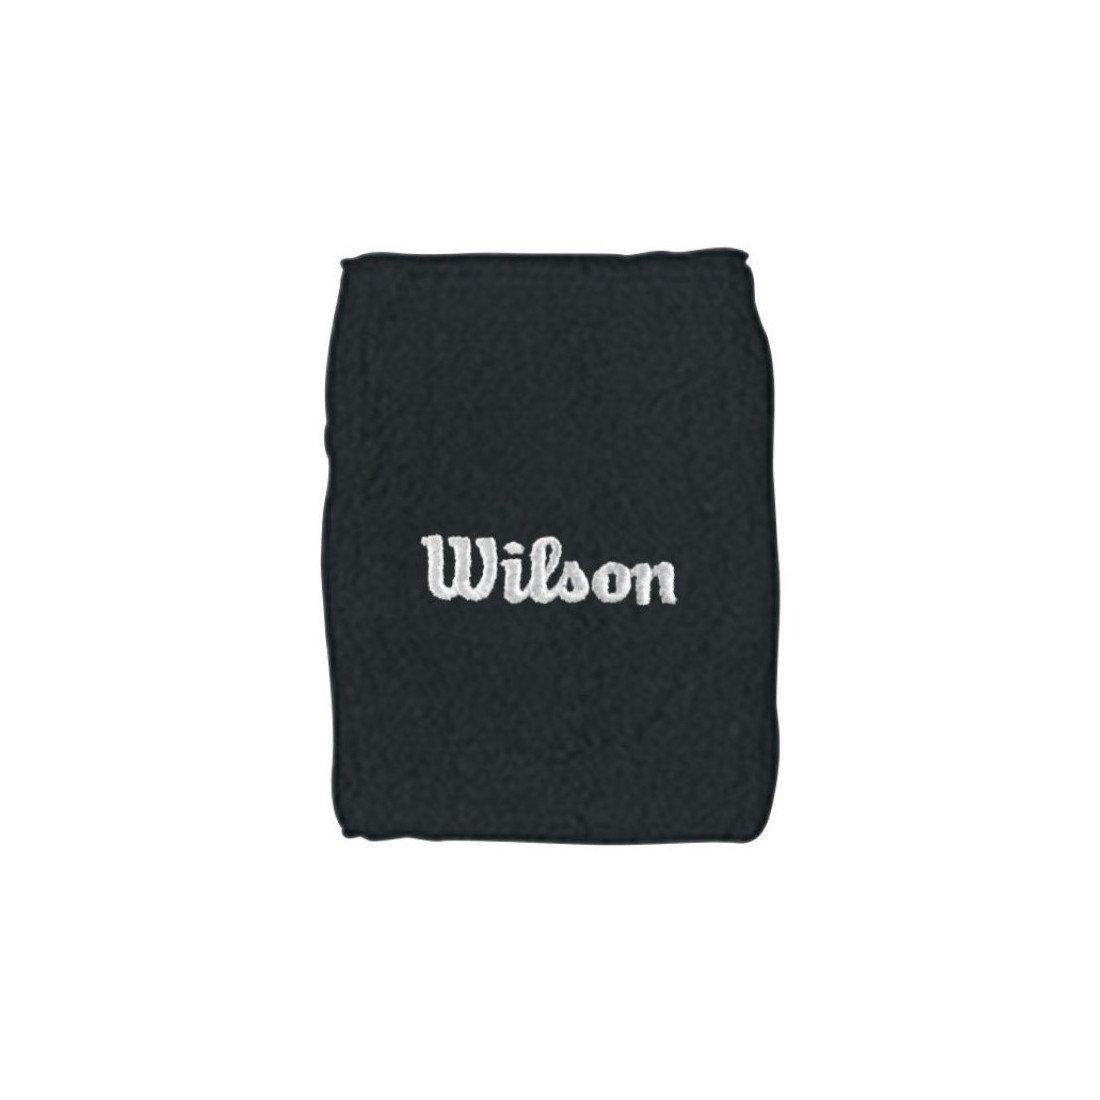 Wilson Tennis Accessories – Double Wristband (black)